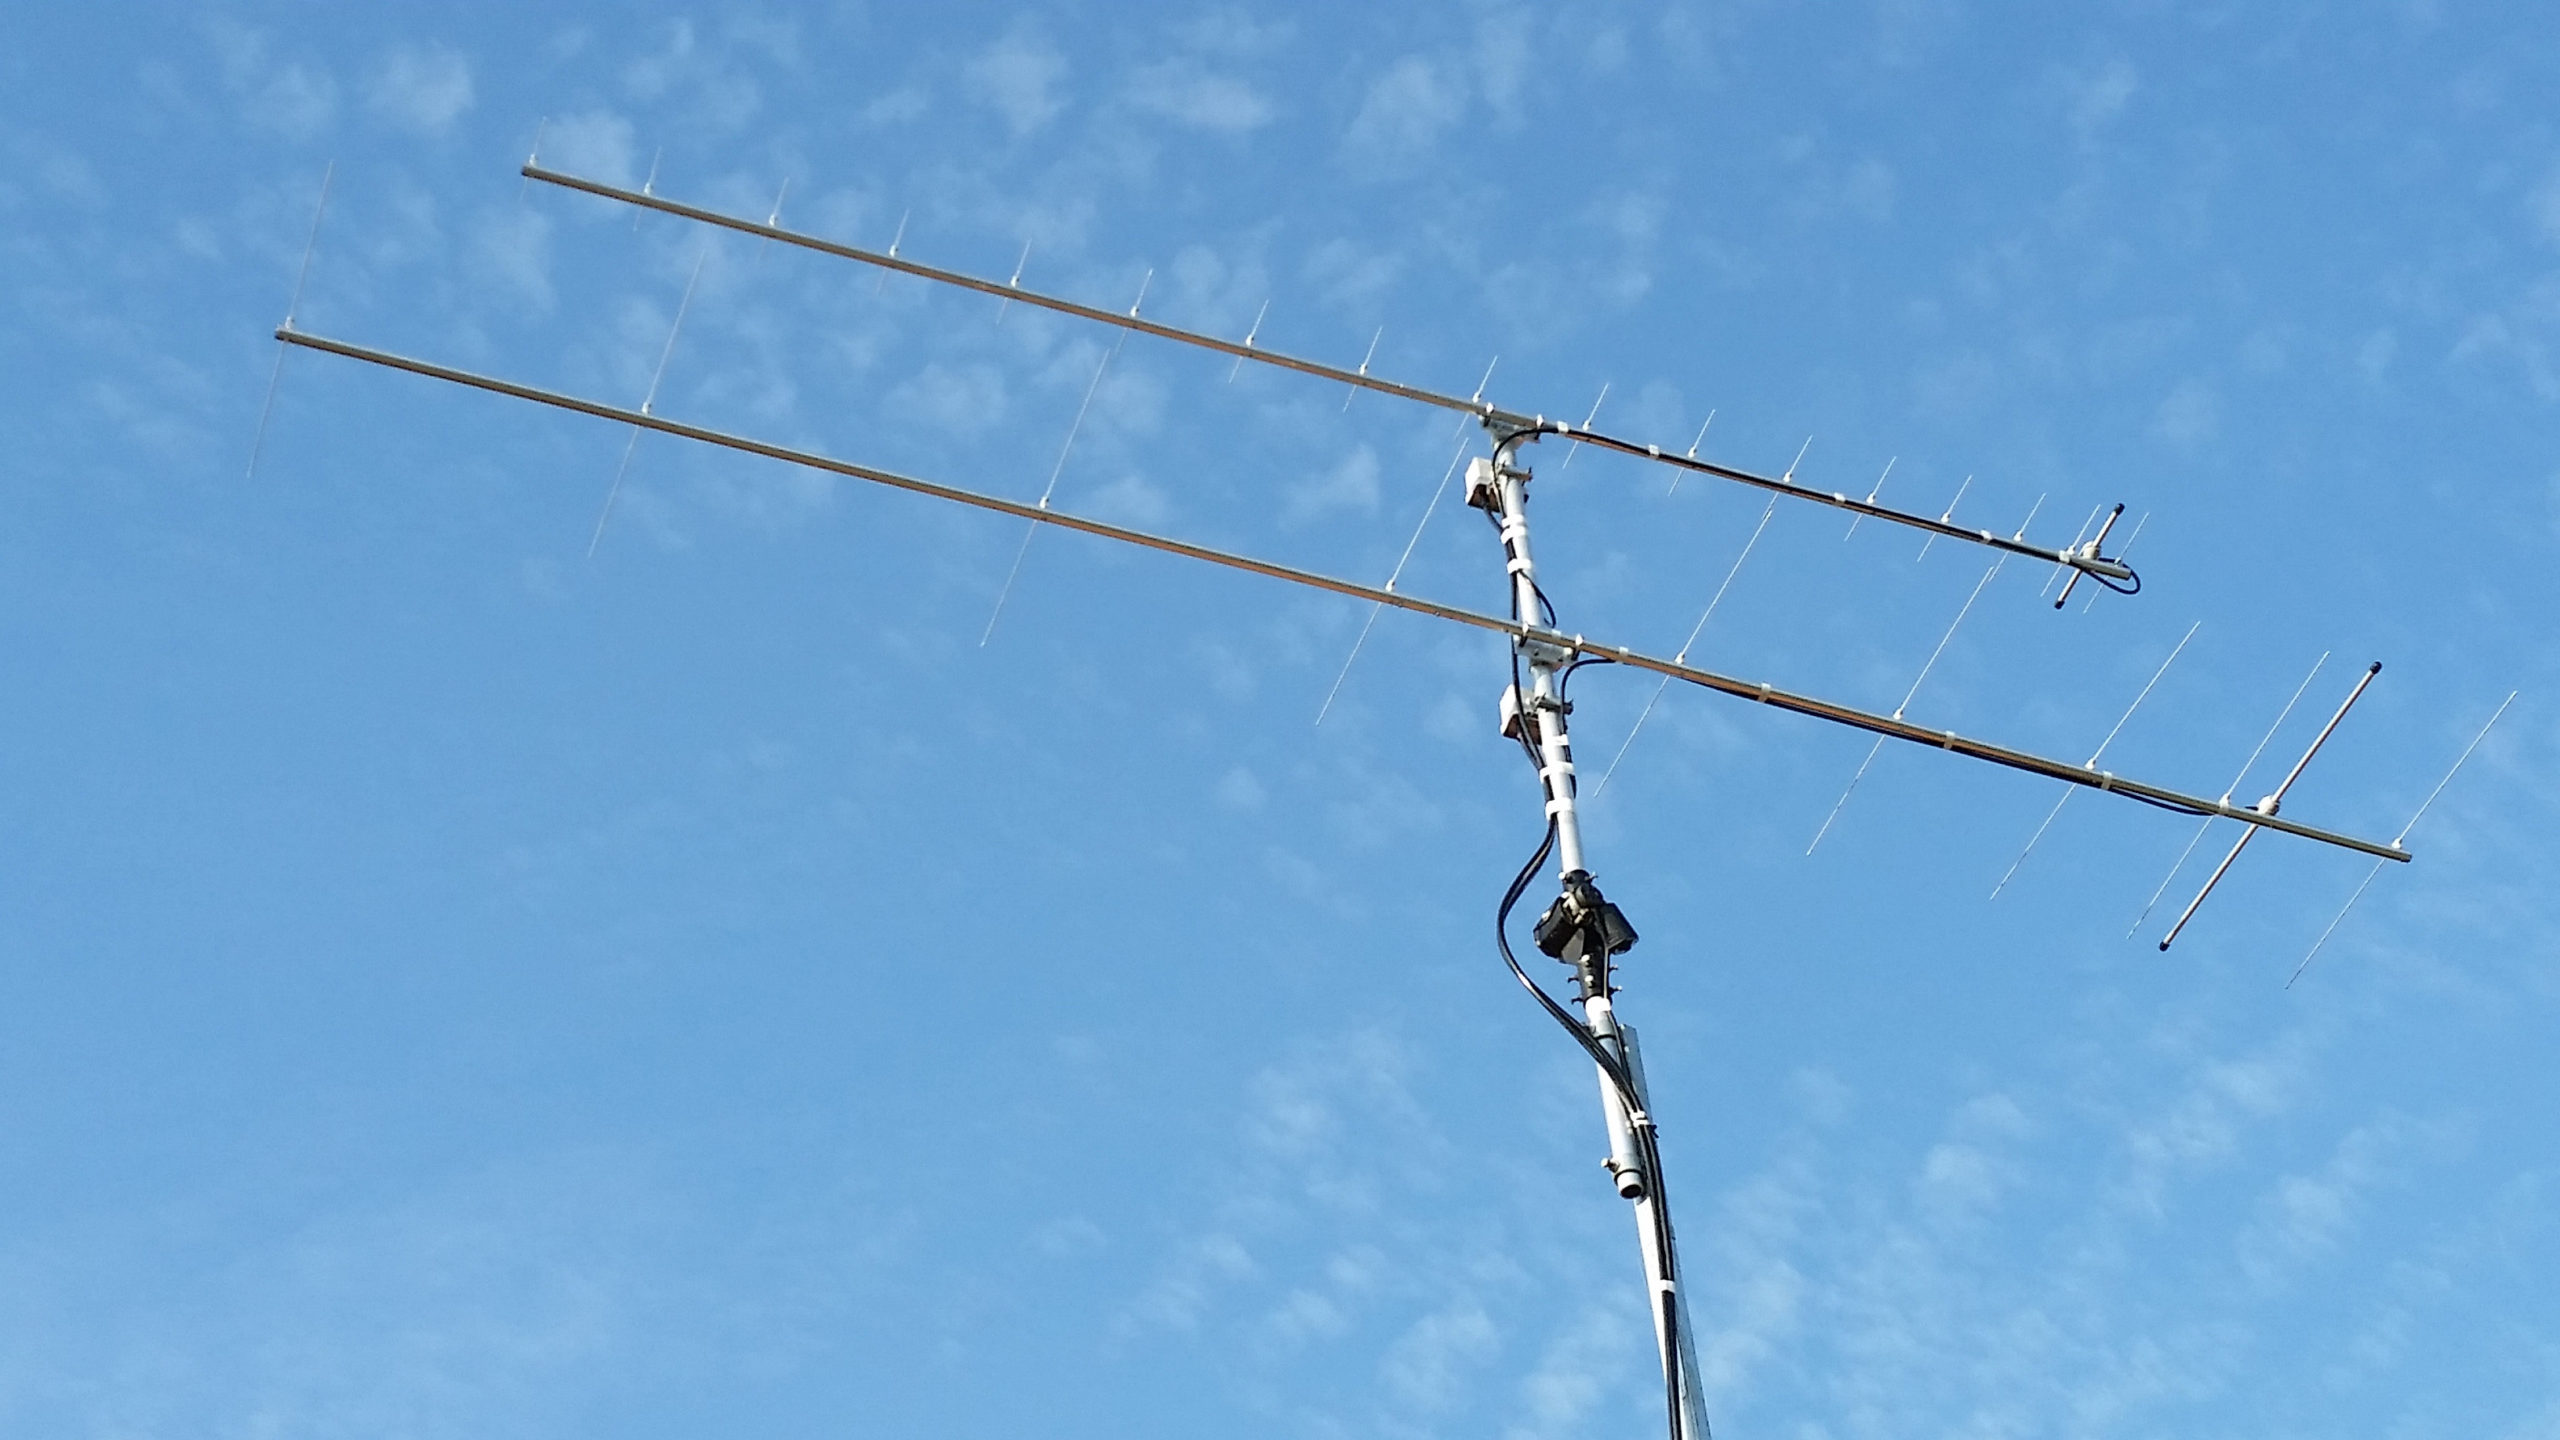 PowAbeam WS718562 432 MHz 18 element Antenna above a WAXXX10S 144MHz PowAbeam